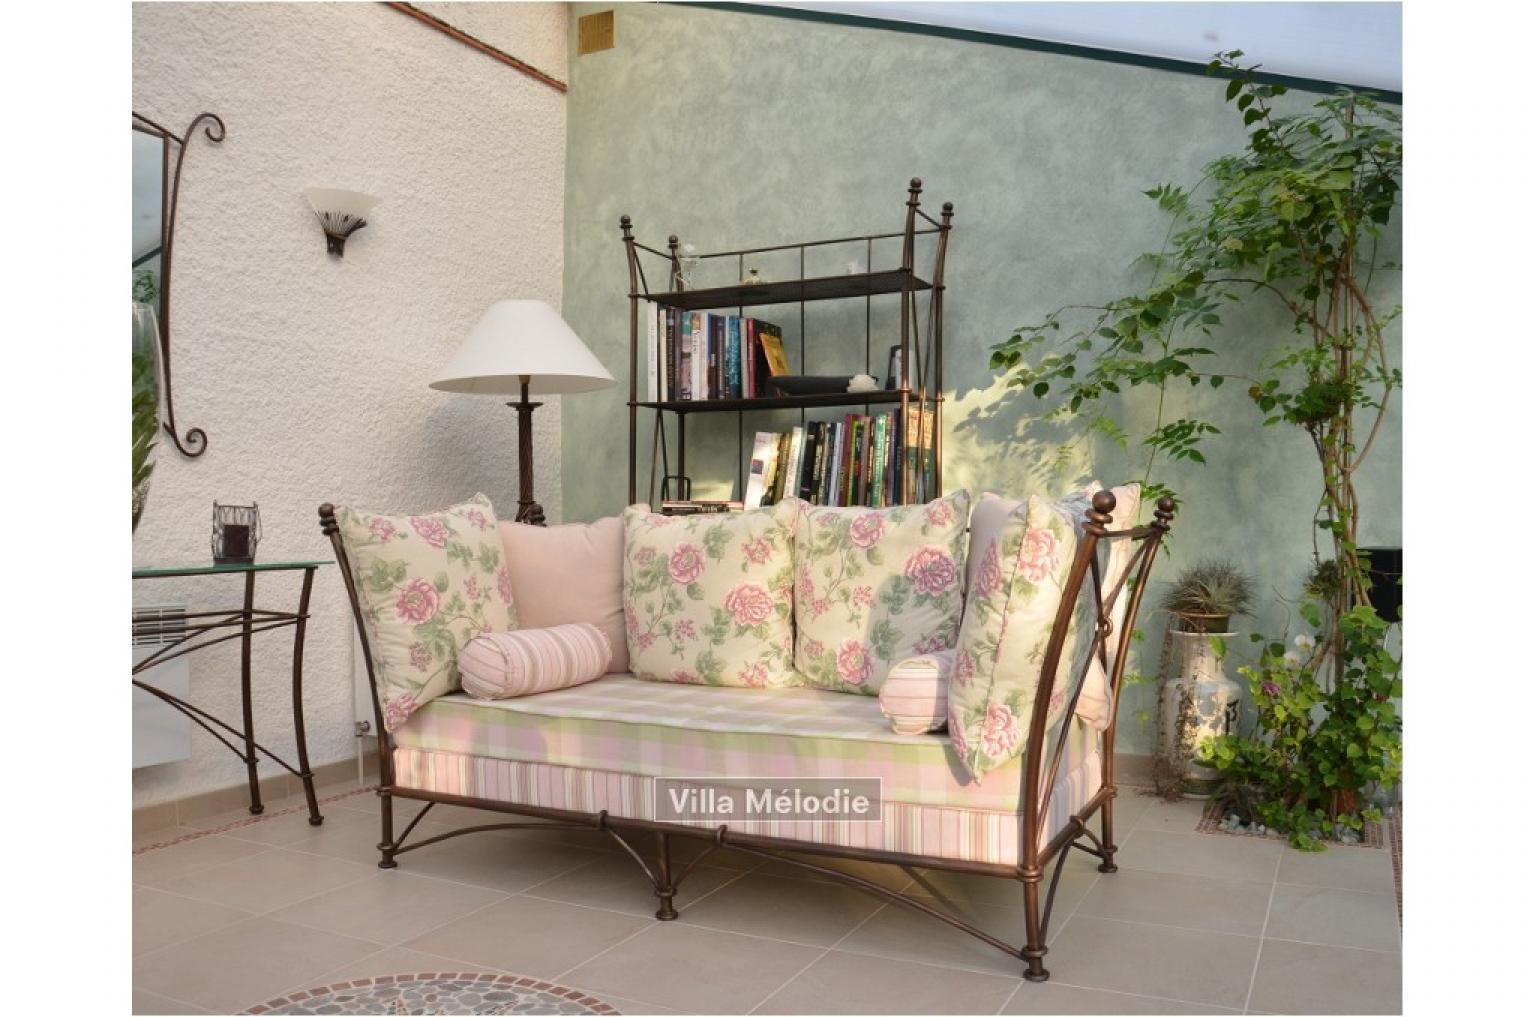 photos canap en fer forg 3 places. Black Bedroom Furniture Sets. Home Design Ideas